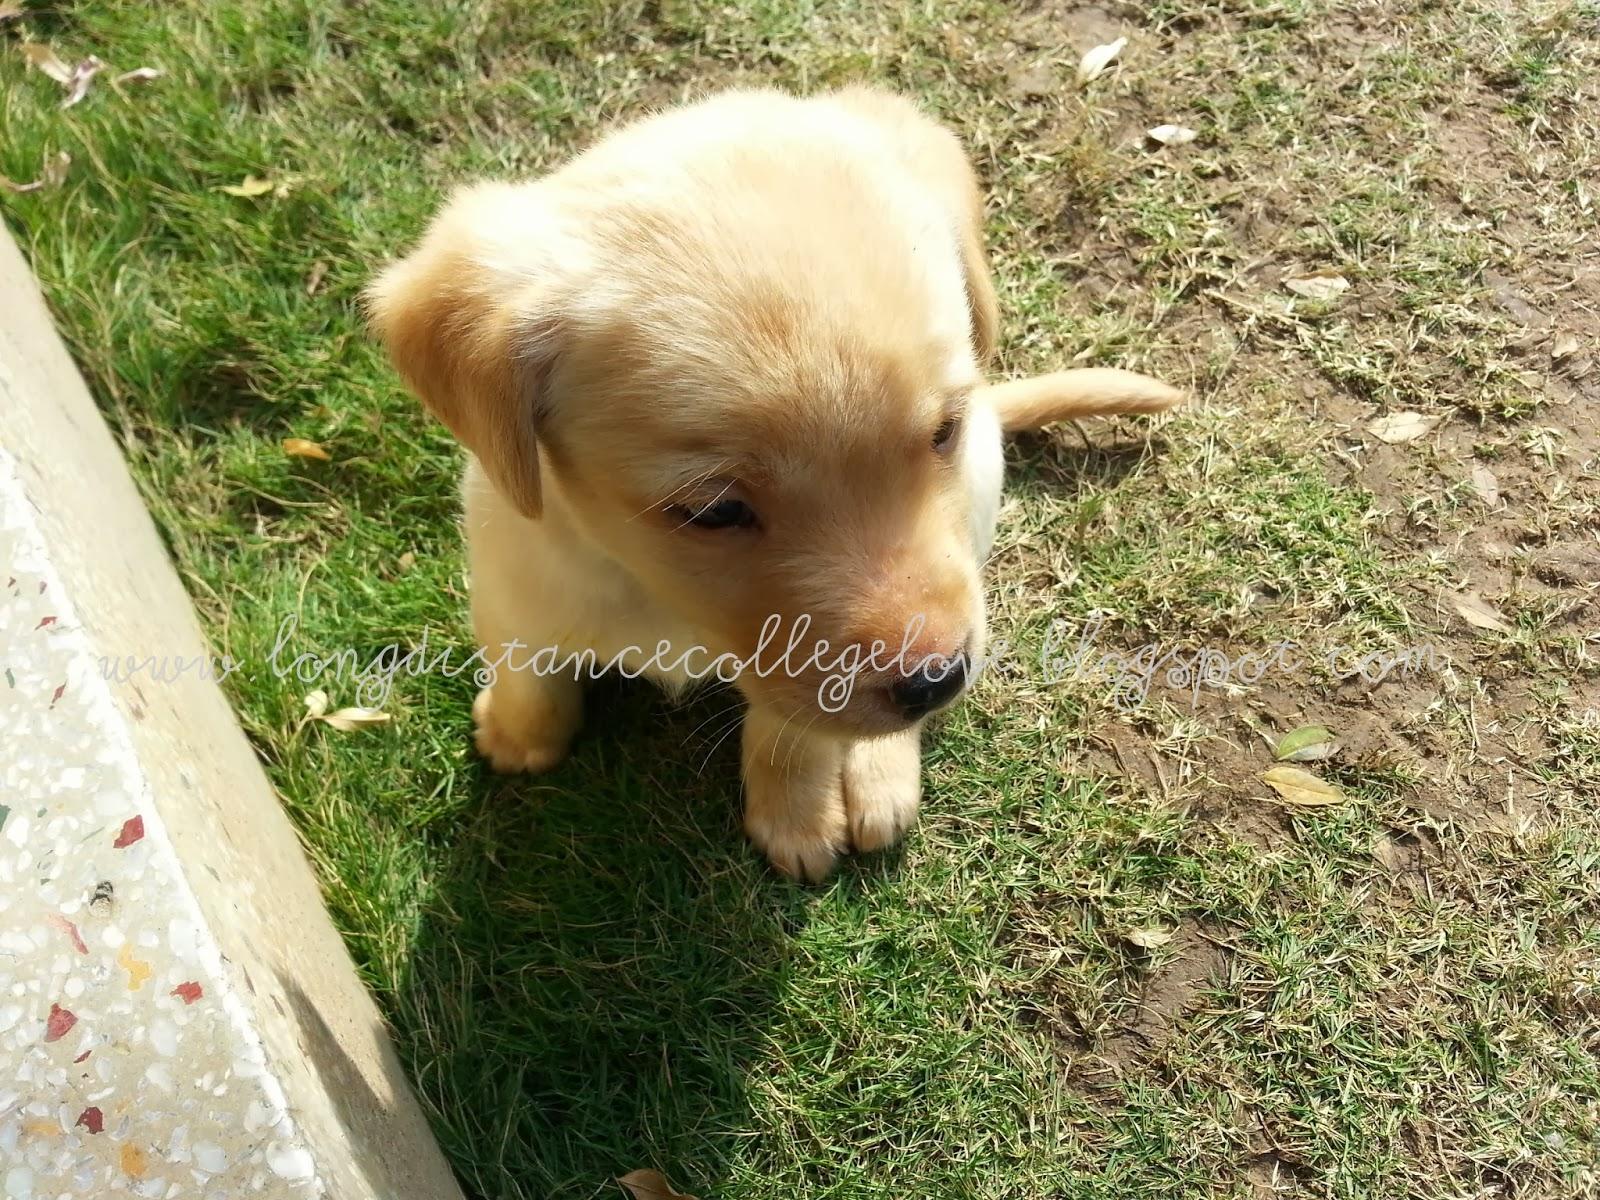 labrador, labrador pu, cute puppies, labrador puppy, one month old labrador, cute golden labrador pup